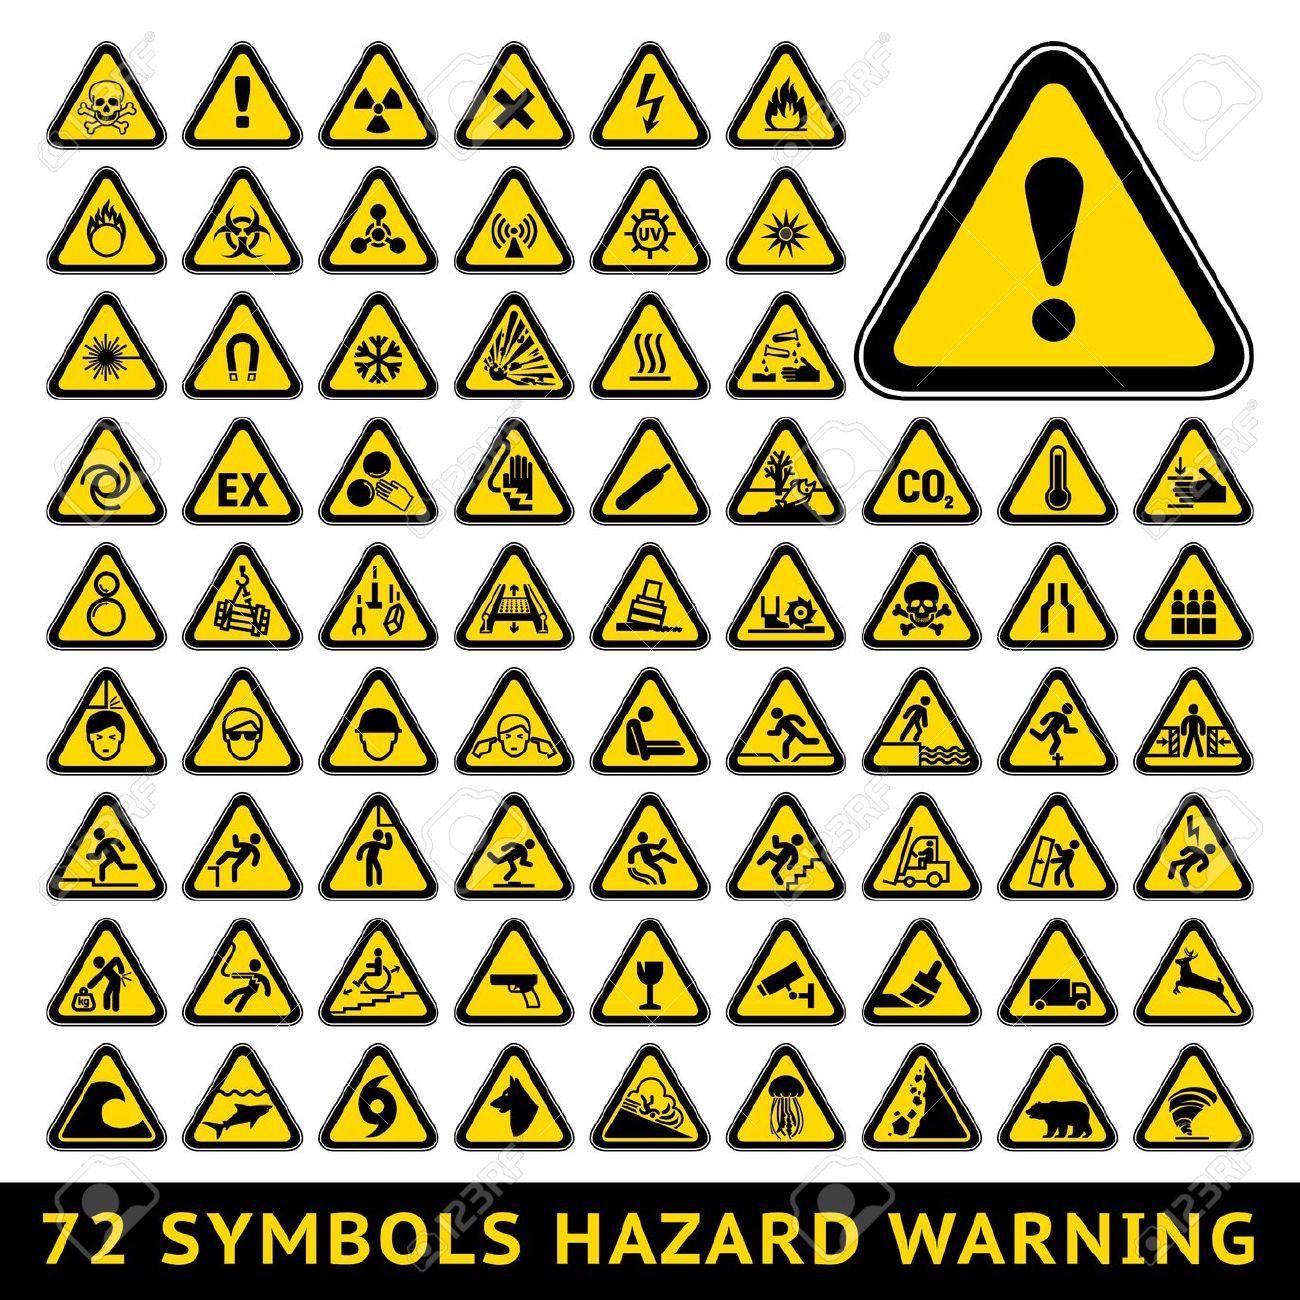 Warning symbols hand google search put on the kids 100th day illustration of triangular warning hazard symbols big set vector art clipart and stock vectors buycottarizona